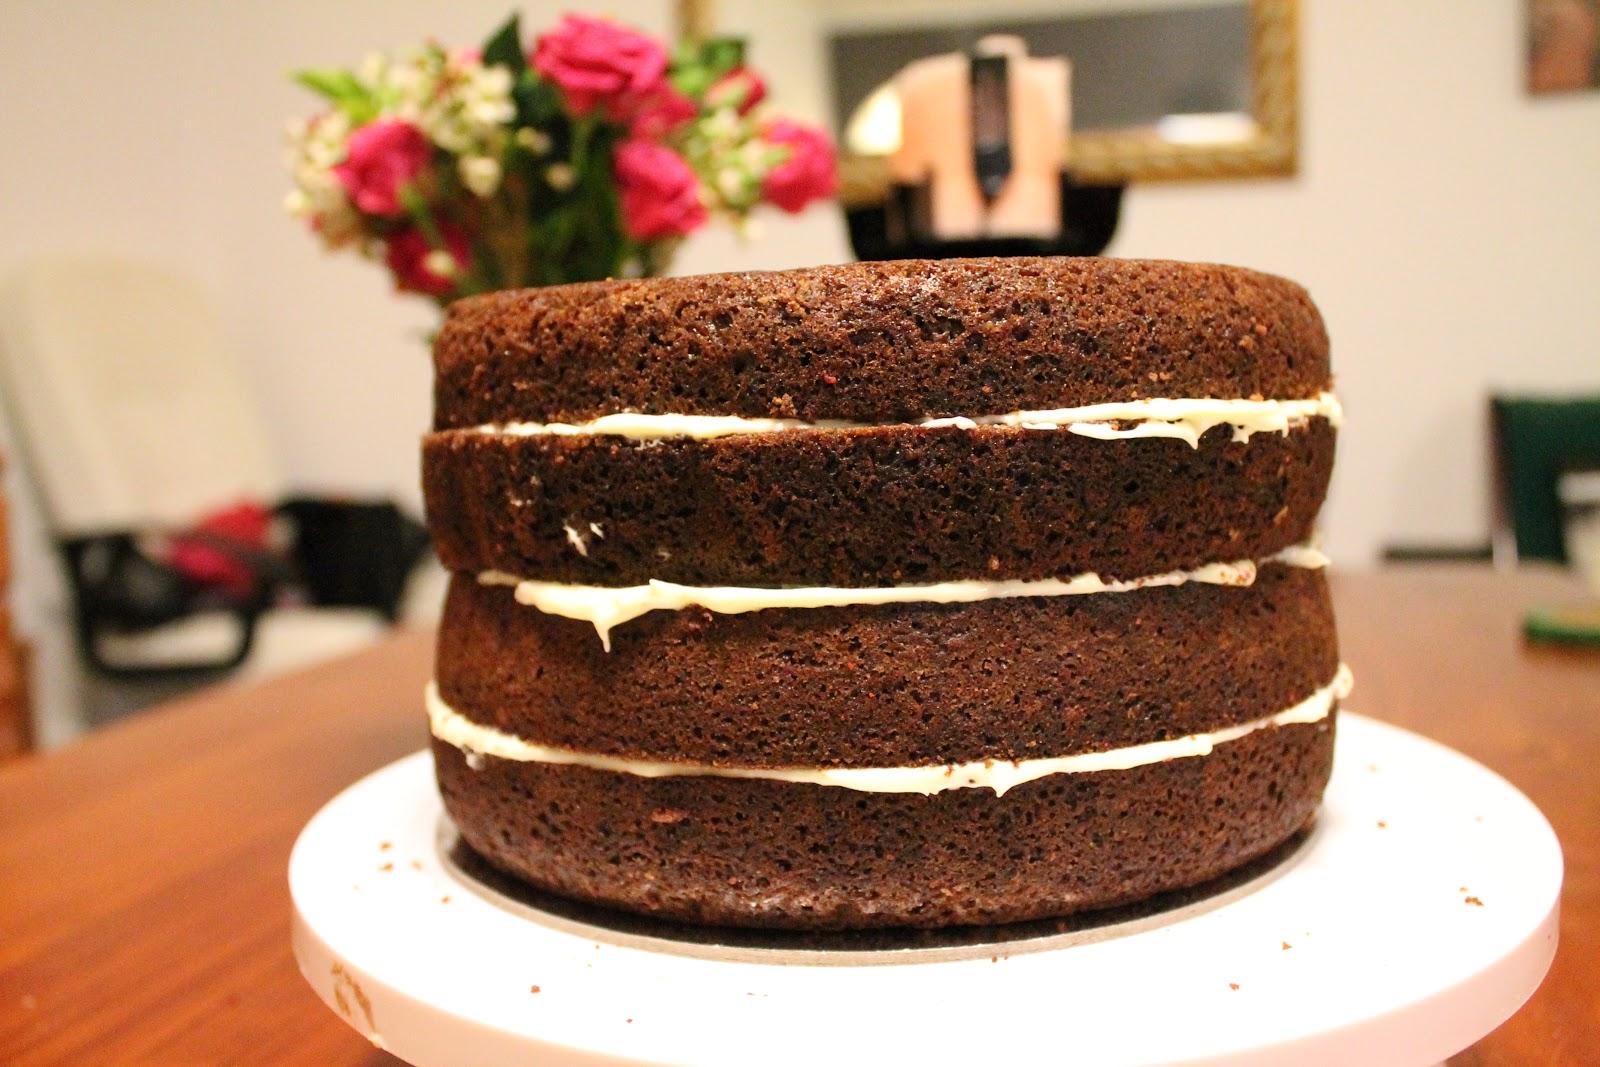 Stacking Wedding Cakes Layers Using Separators